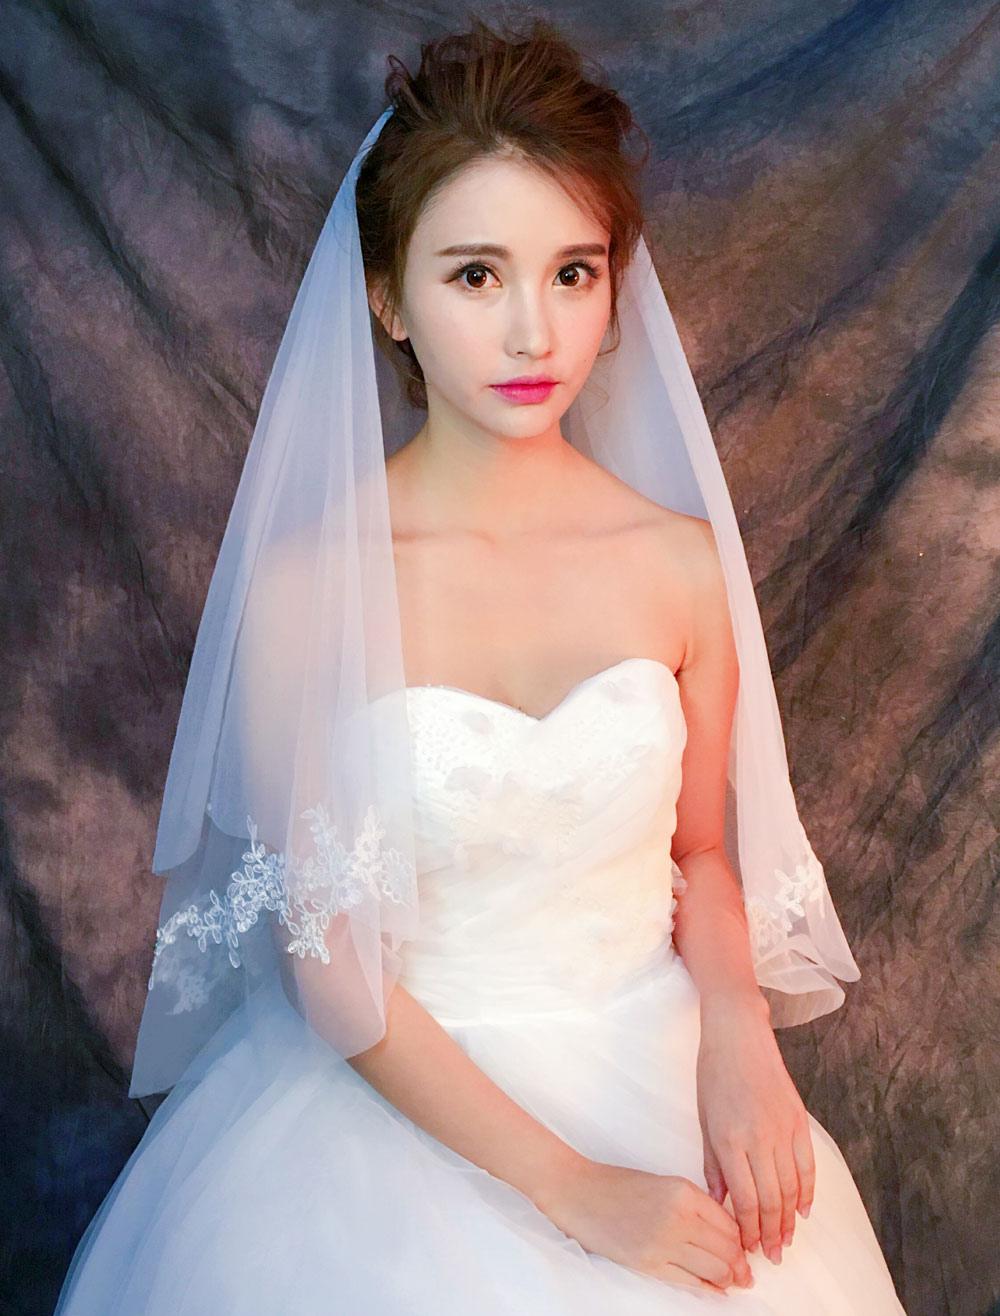 Ivory Wedding Veil 1 Tier Cut Edge Lace Applique Waterfall Bridal Veil